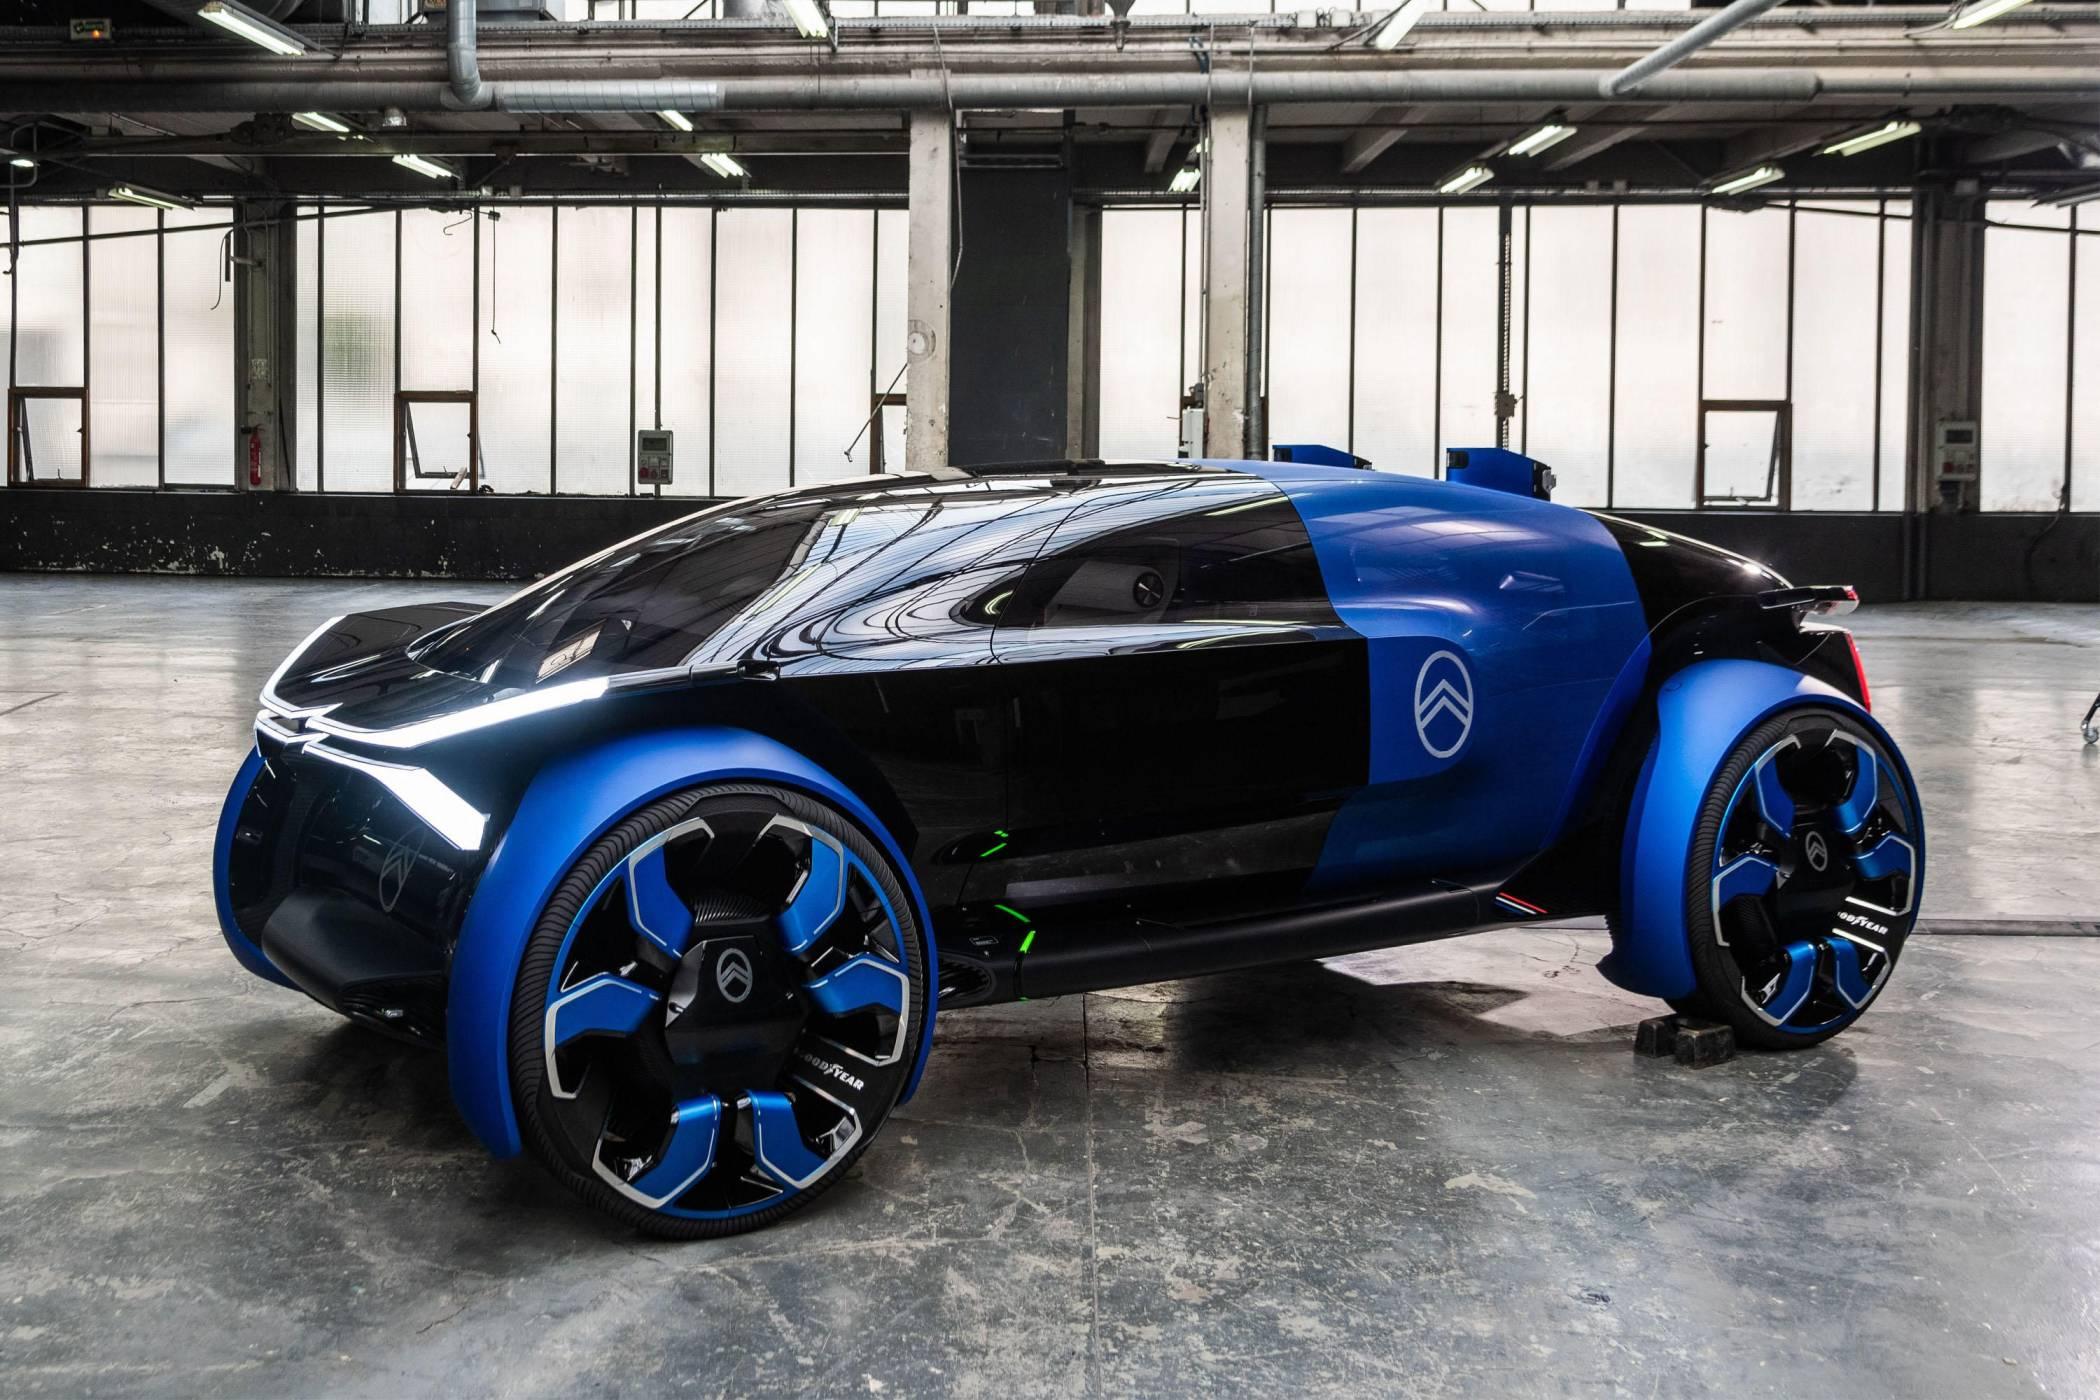 Citroën 19_19 Concept е кръстоска между офис и всекидневна на колела